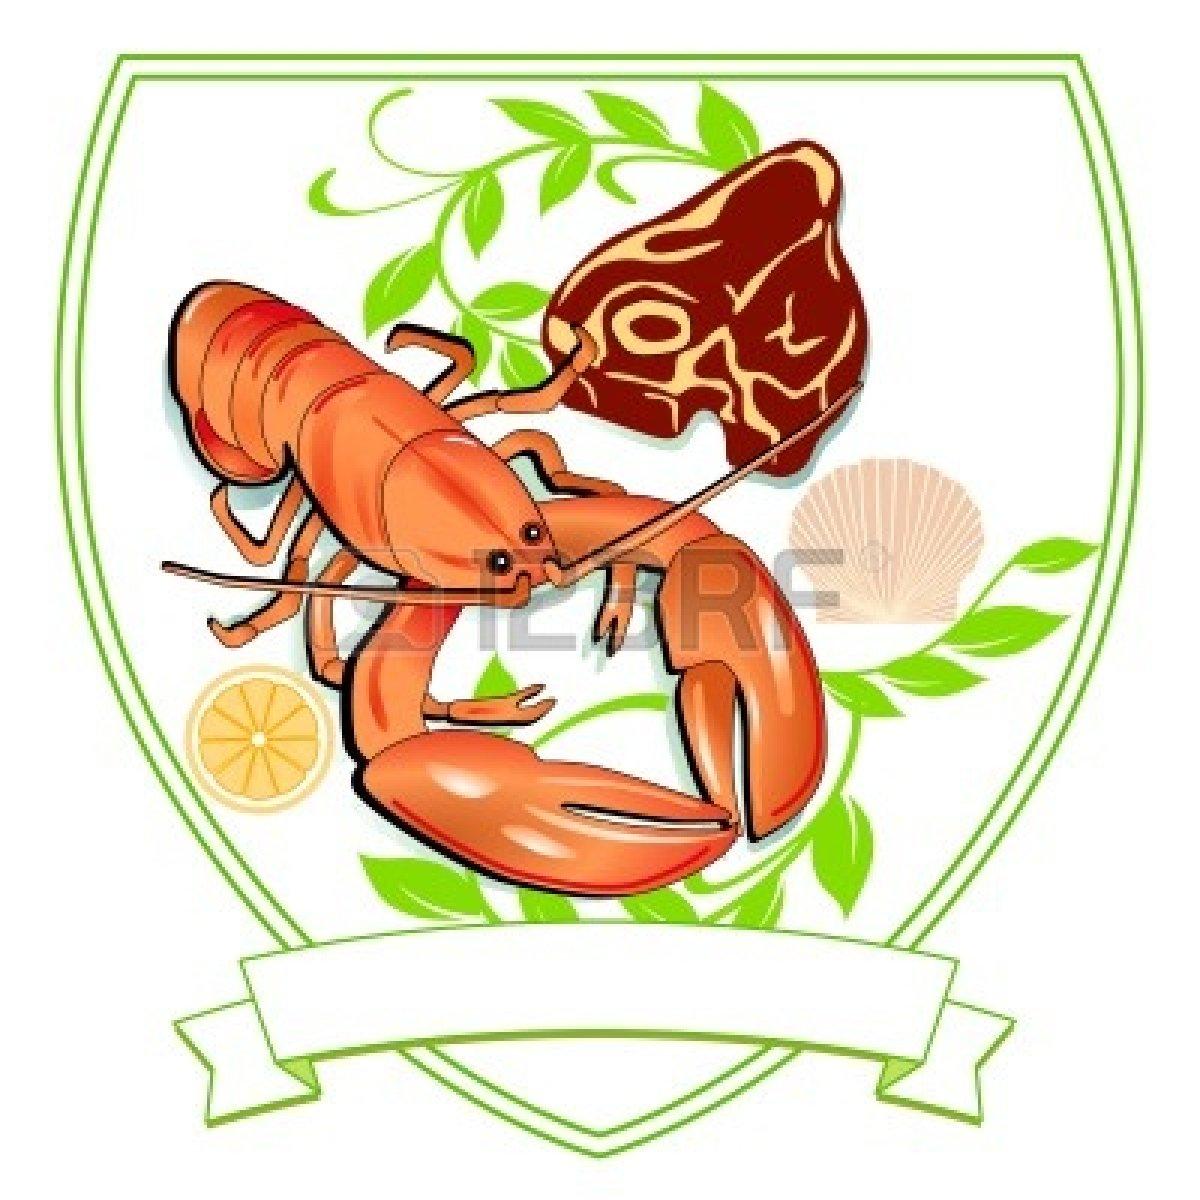 hight resolution of 1200x1200 lobster dinner clipart